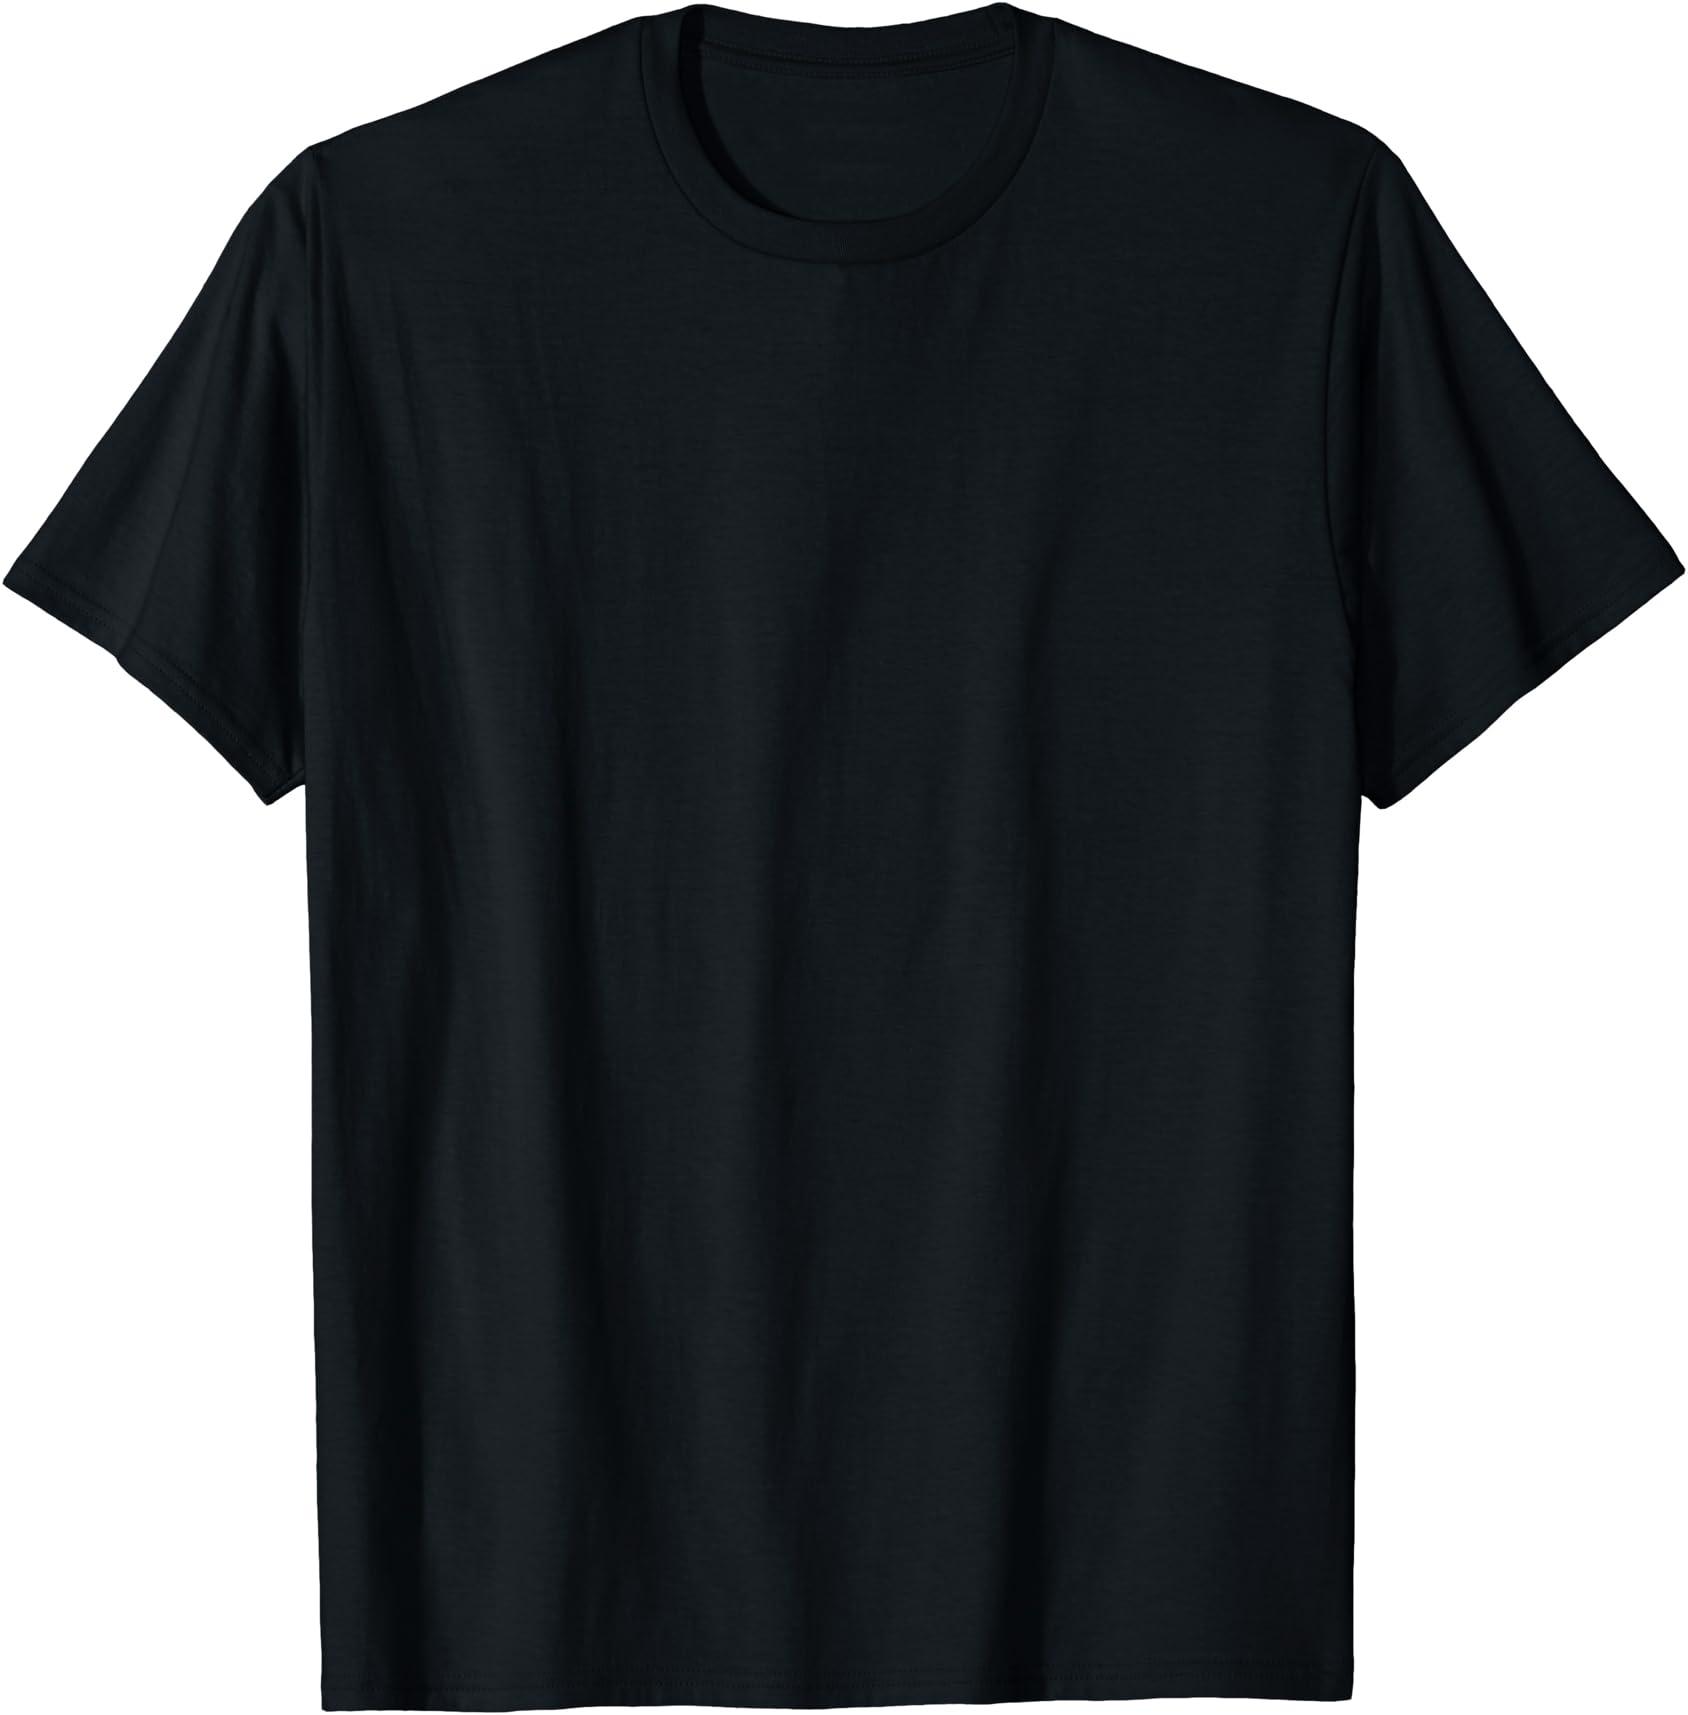 Design By Humans Yogi Tree Boys Youth Graphic T Shirt